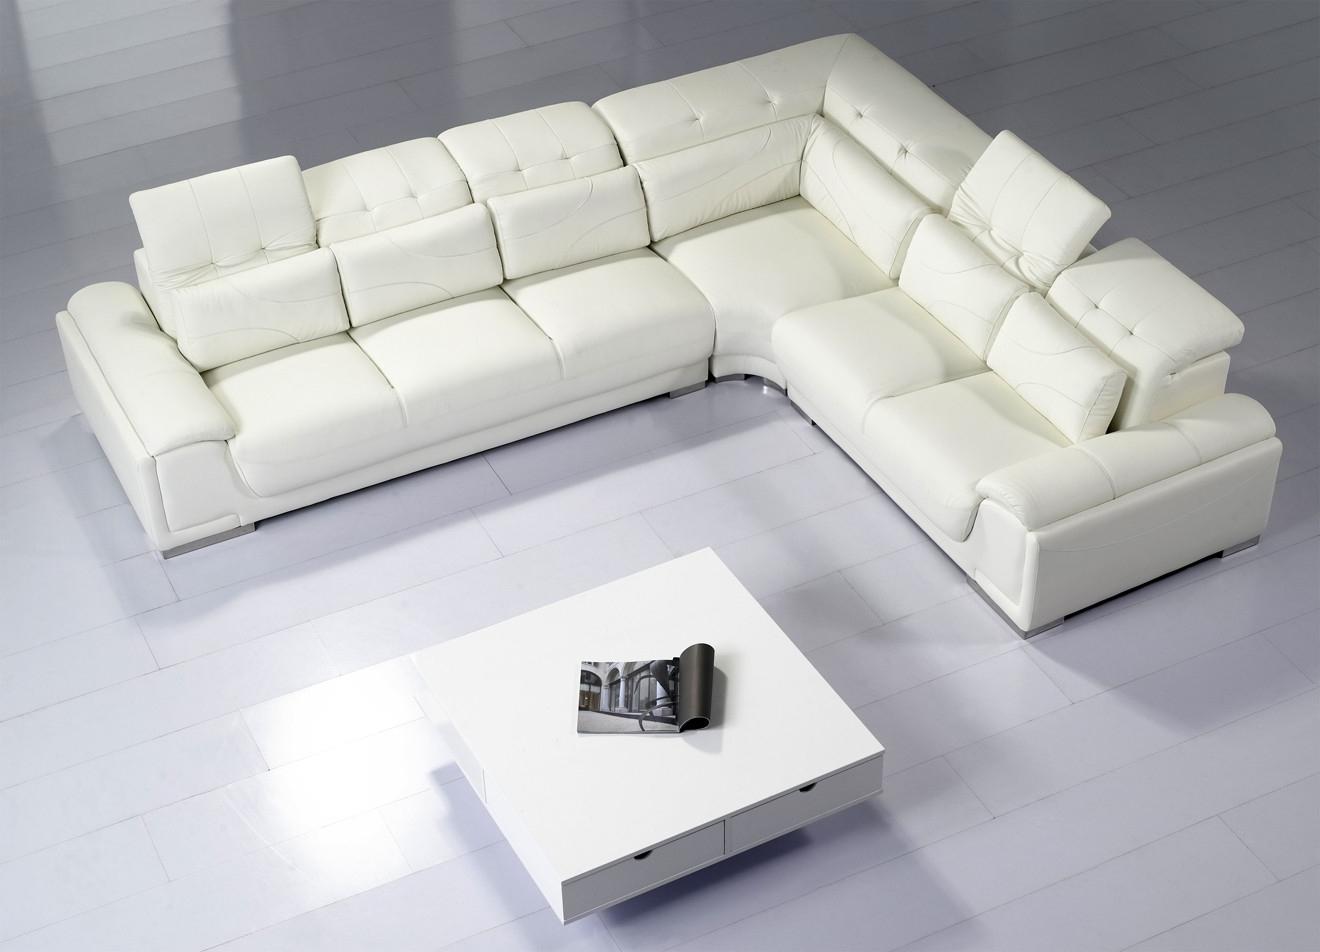 Thecreativescientist Pertaining To Trendy White Leather Corner Sofas (View 14 of 15)